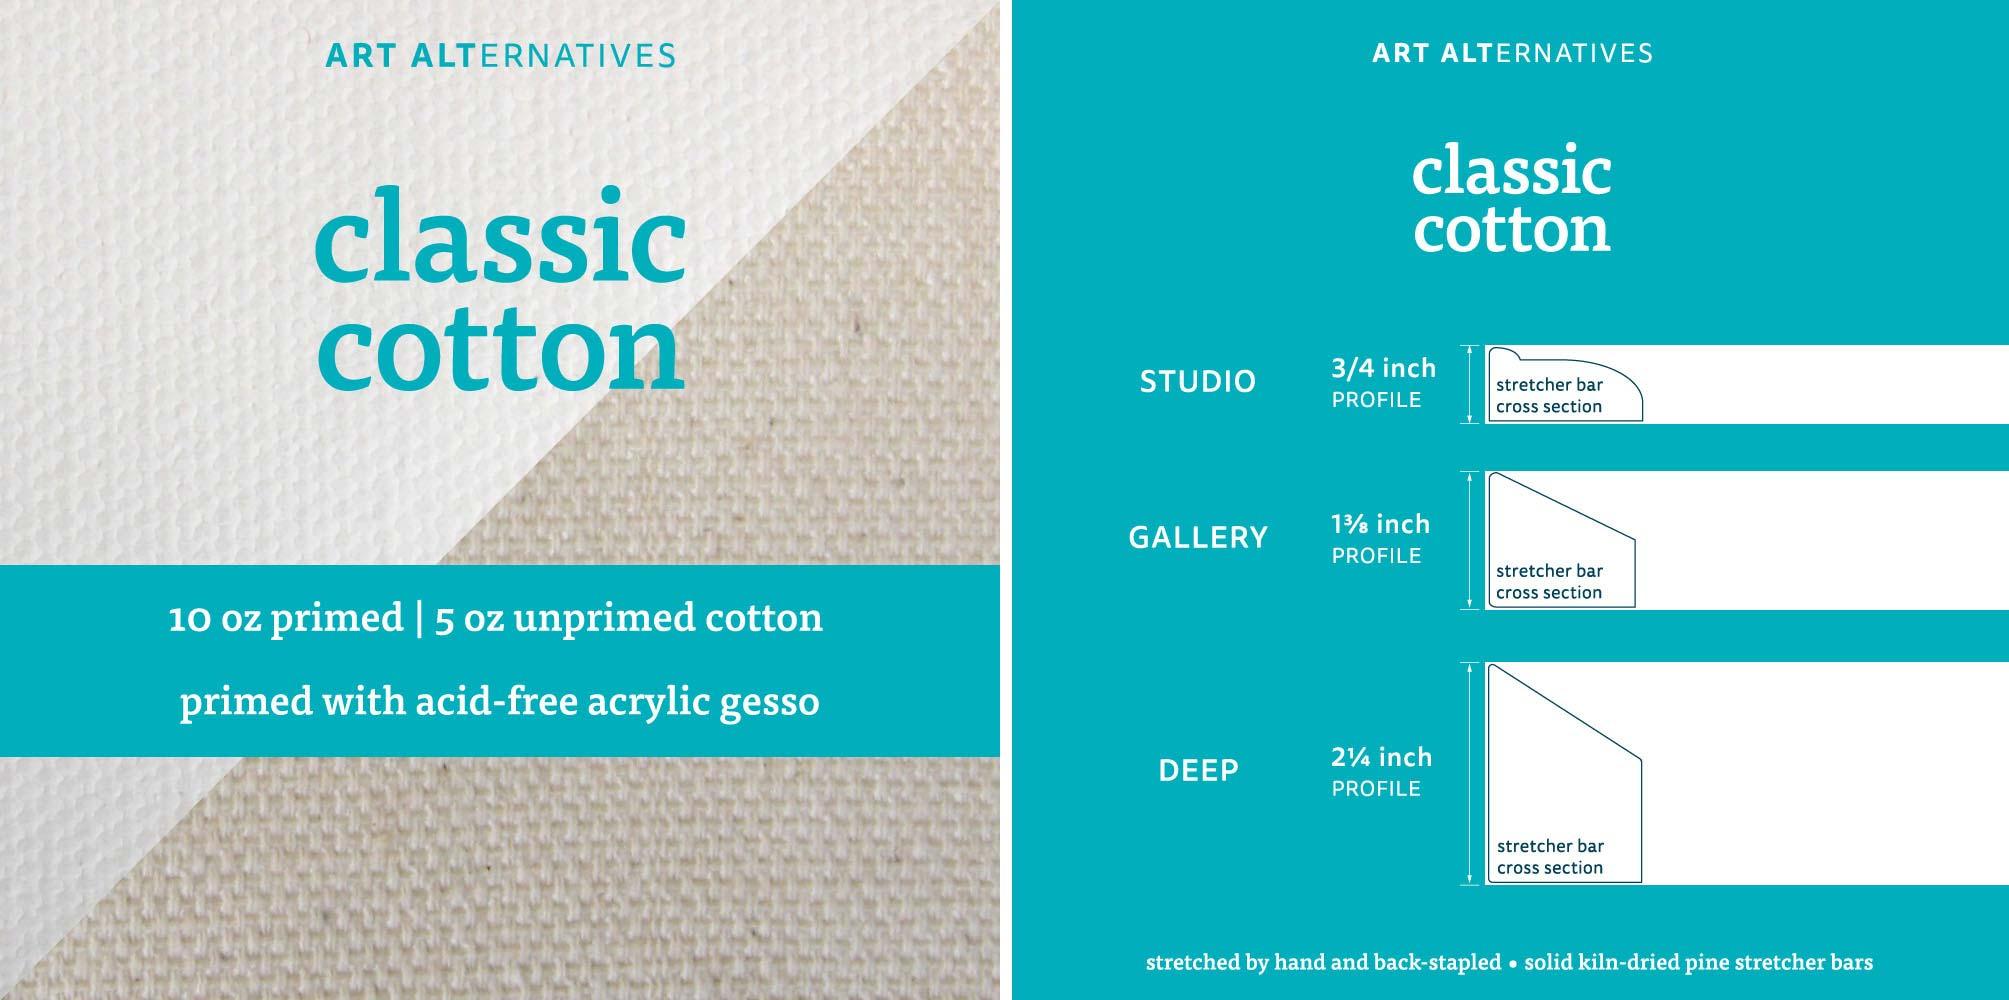 Art Alternatives Gallery Canvas 24X30